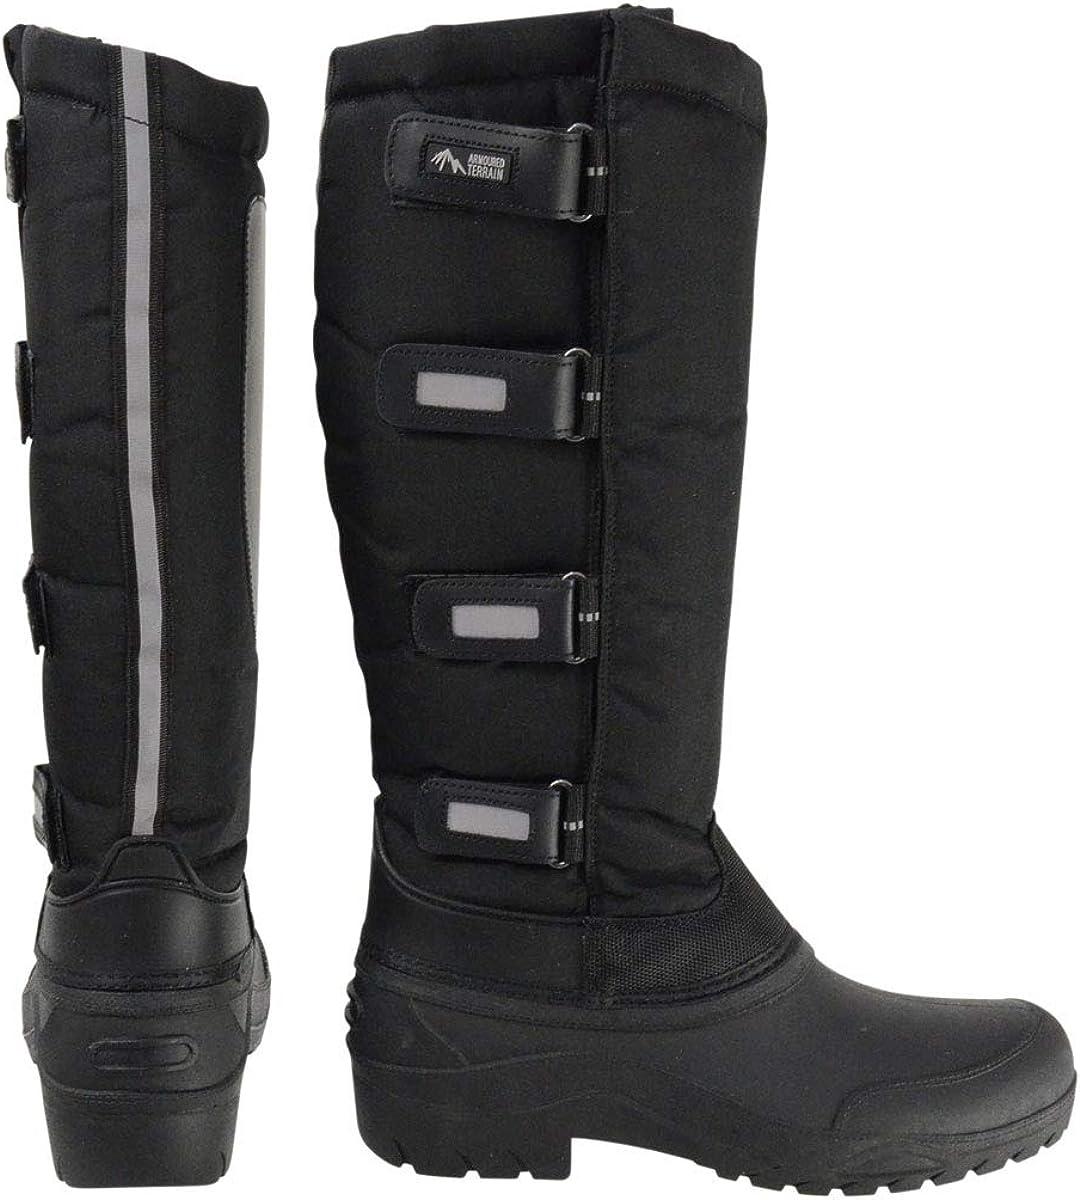 HyLAND Childrens/Kids Atlantic Winter Boots